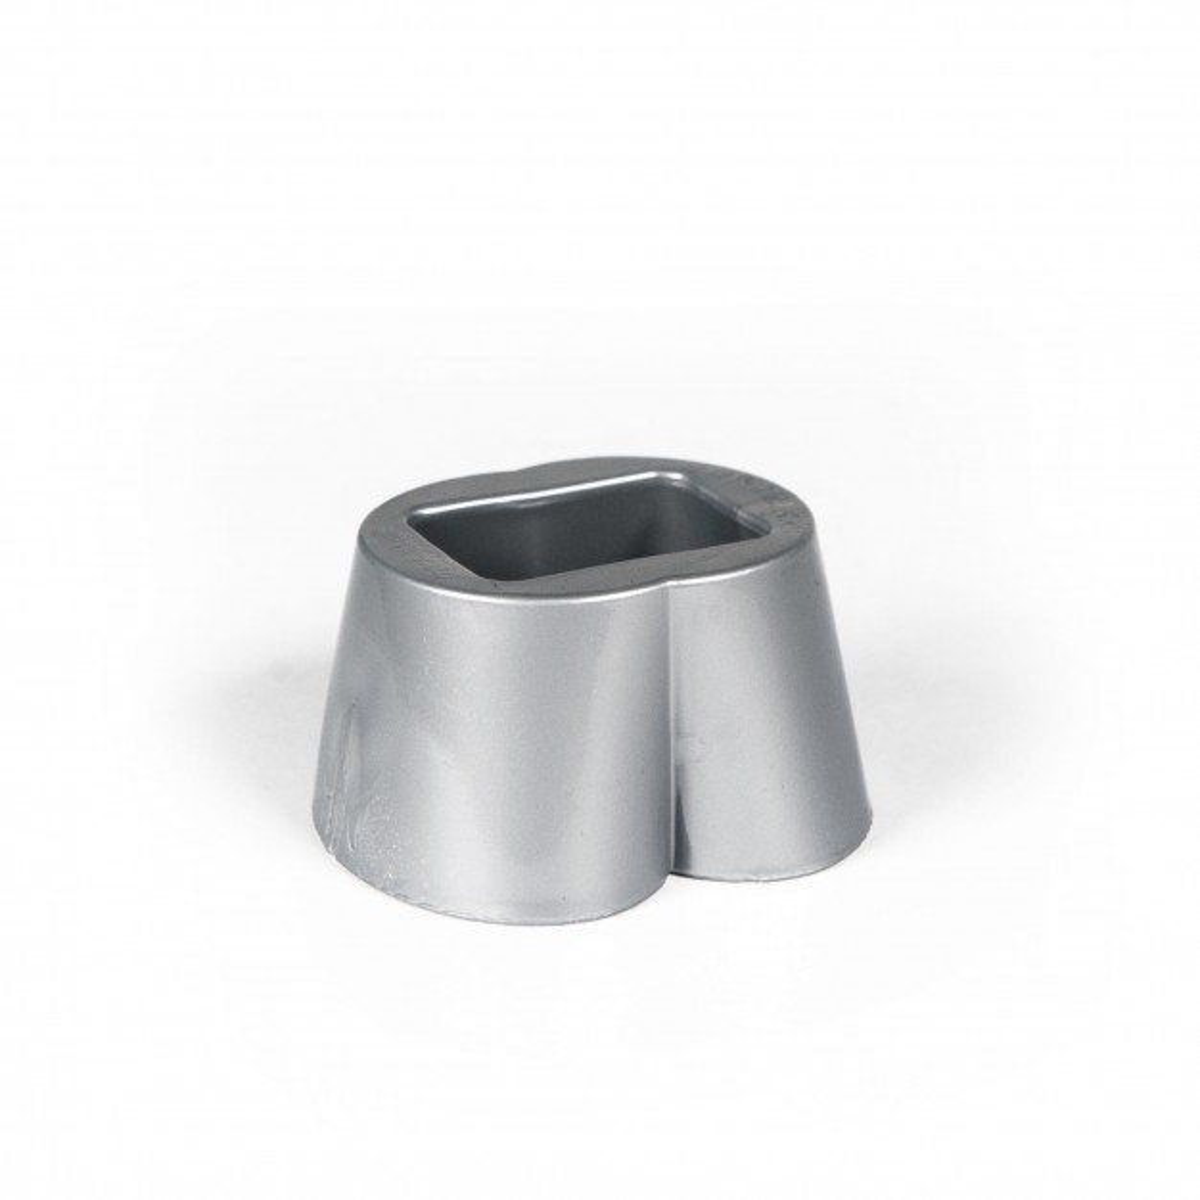 Natahovač varlat Zizi Radar stříbrný